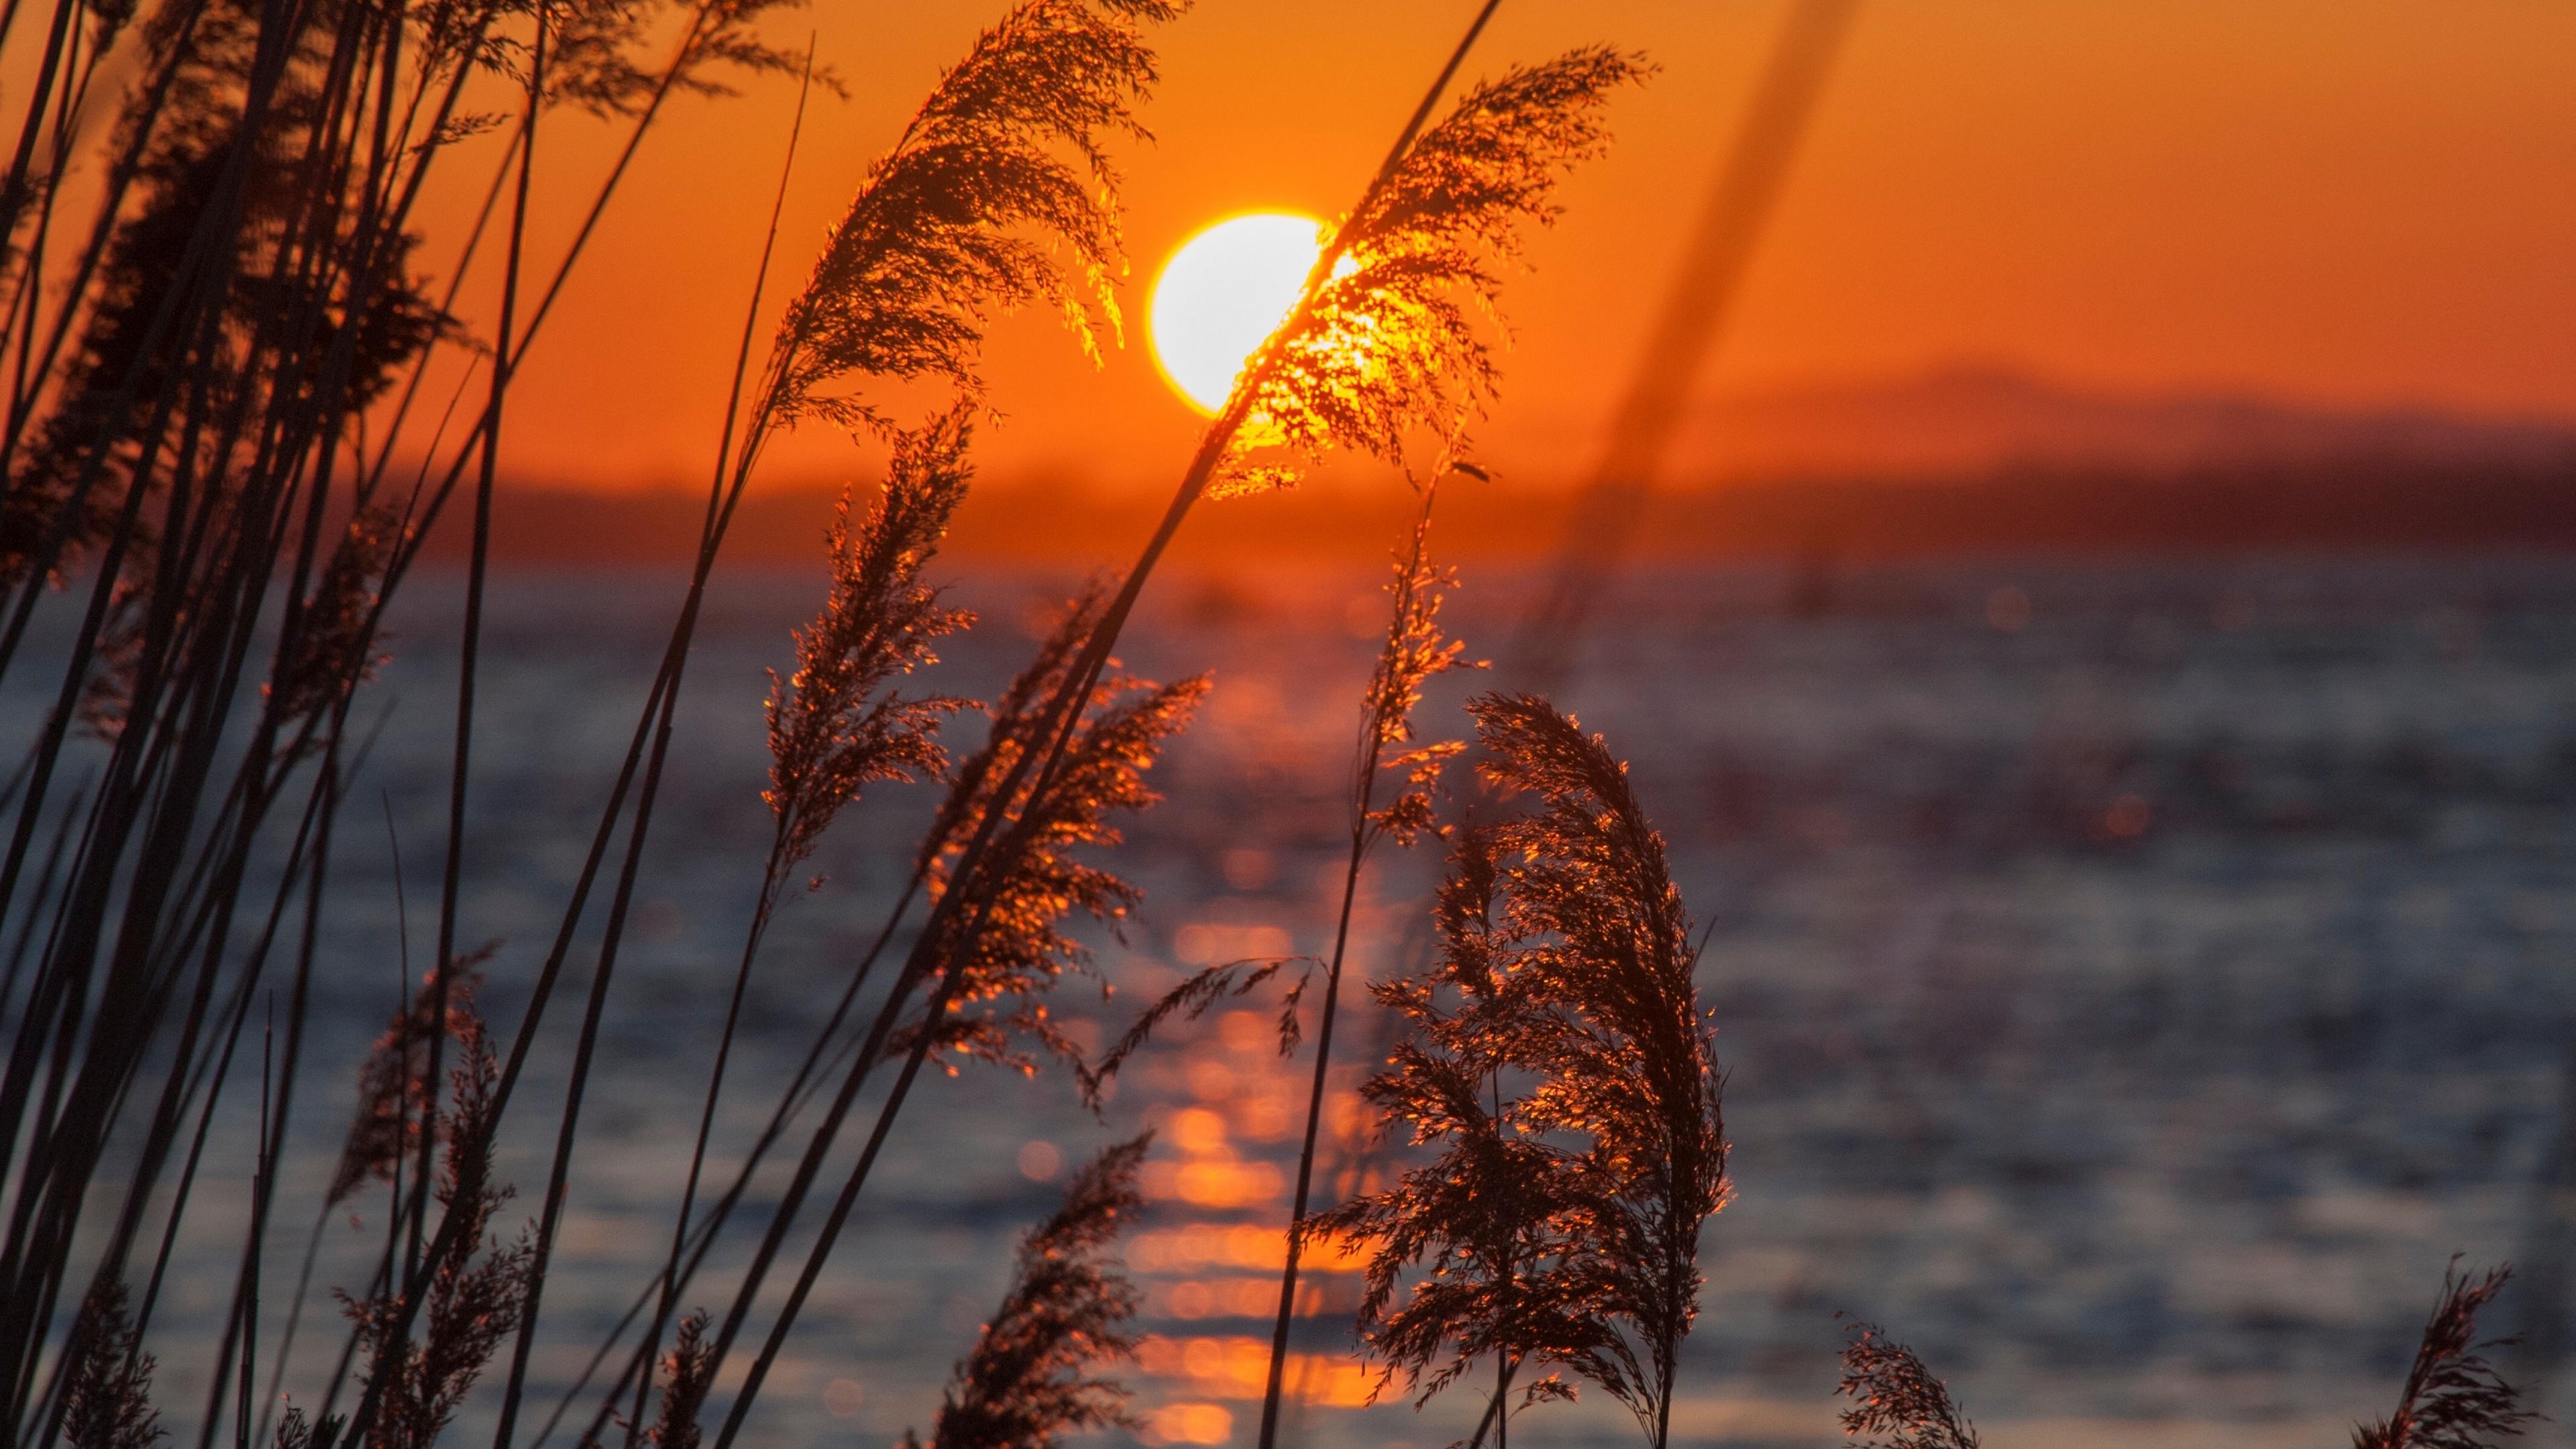 Sunset in reeds wallpaper